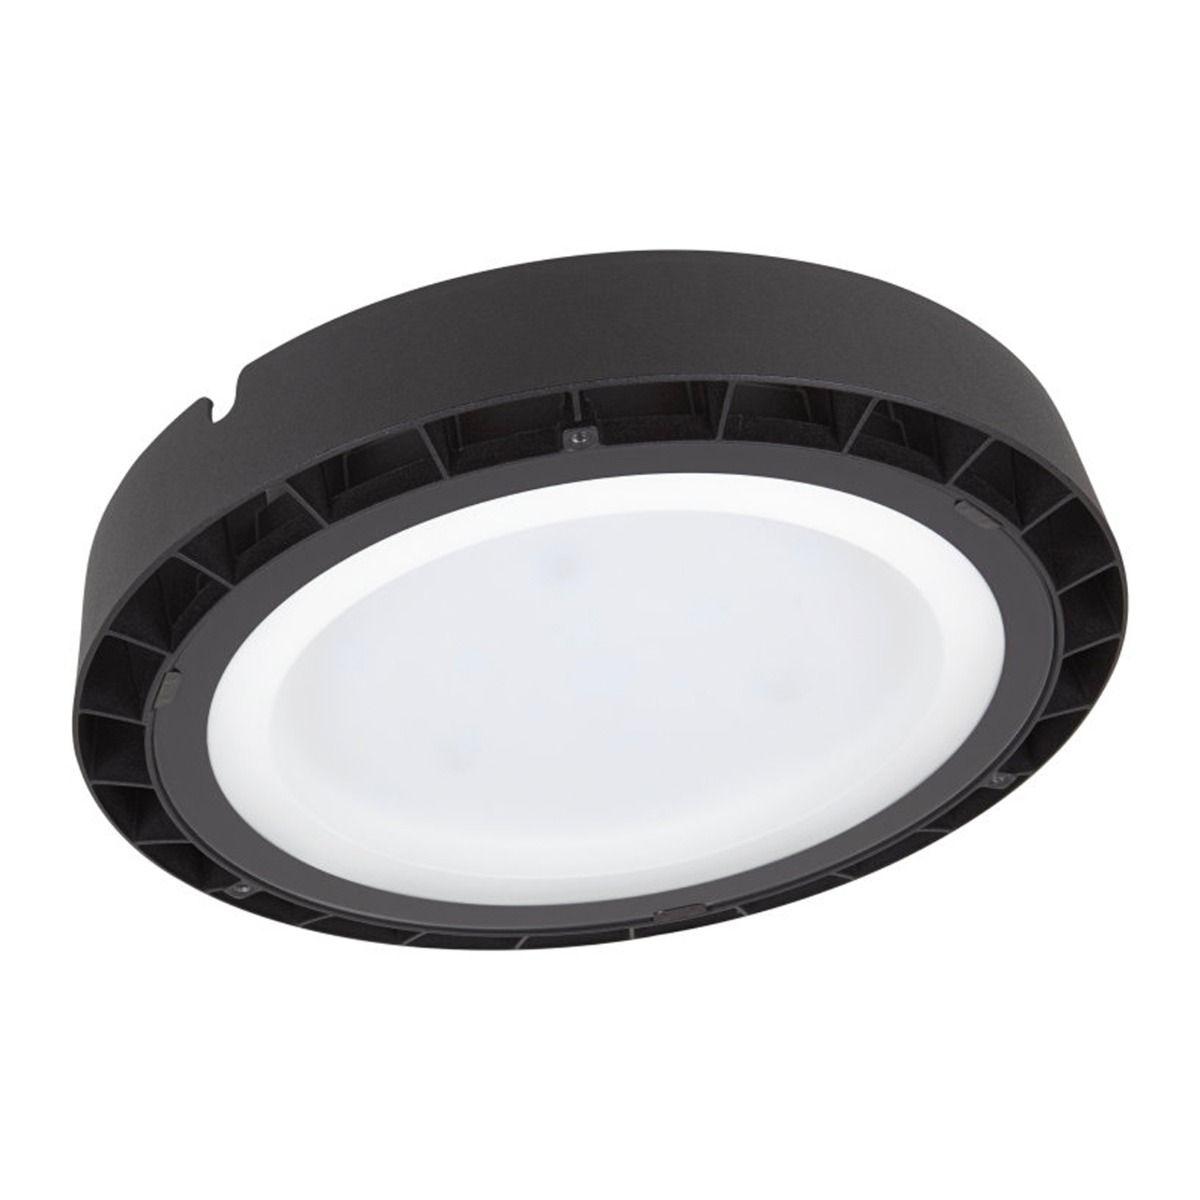 Ledvance LED High Bay Value 200W 6500K IP65 20000lm 100D | Päivänvalo Valkoinen - Korvaa 400W